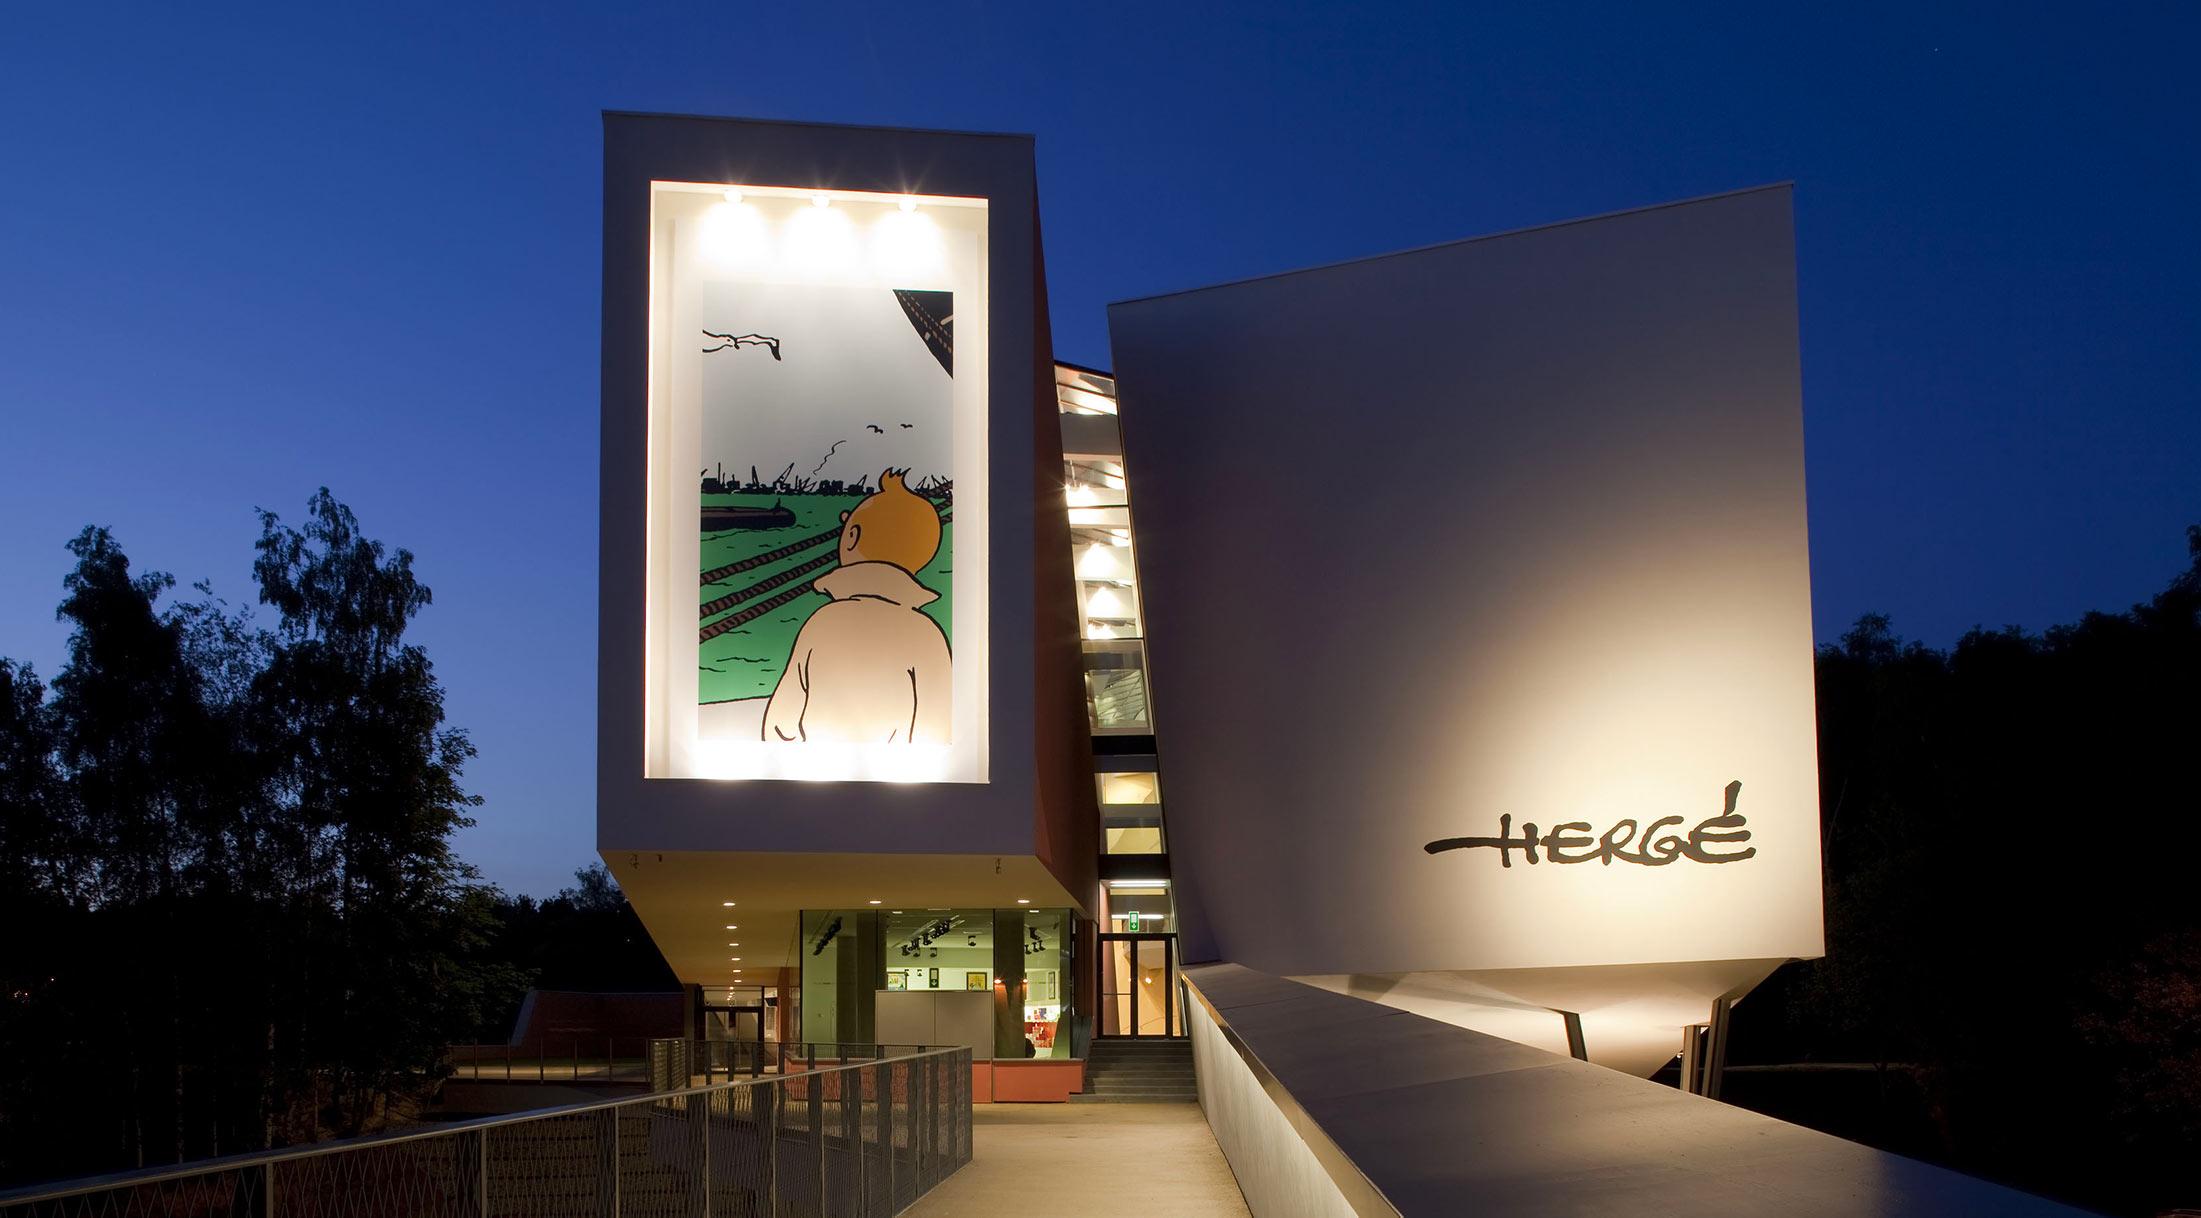 Musée Hergé photo